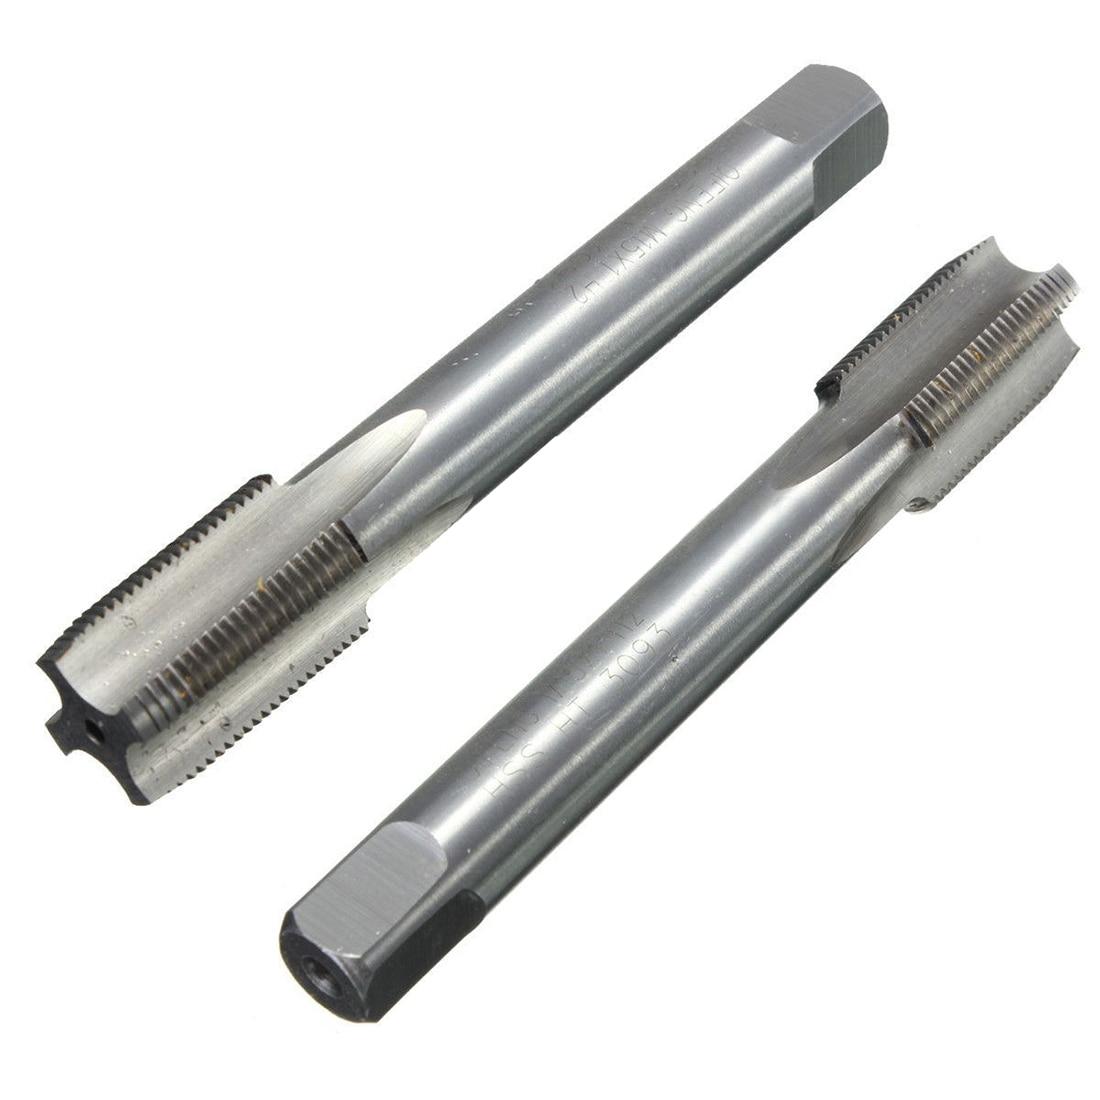 HHTL-1Pc 15mm M15 x M15 1mm Passo HSS Metric Thread Plug Cone Tubo Da Torneira Máquina Torneira